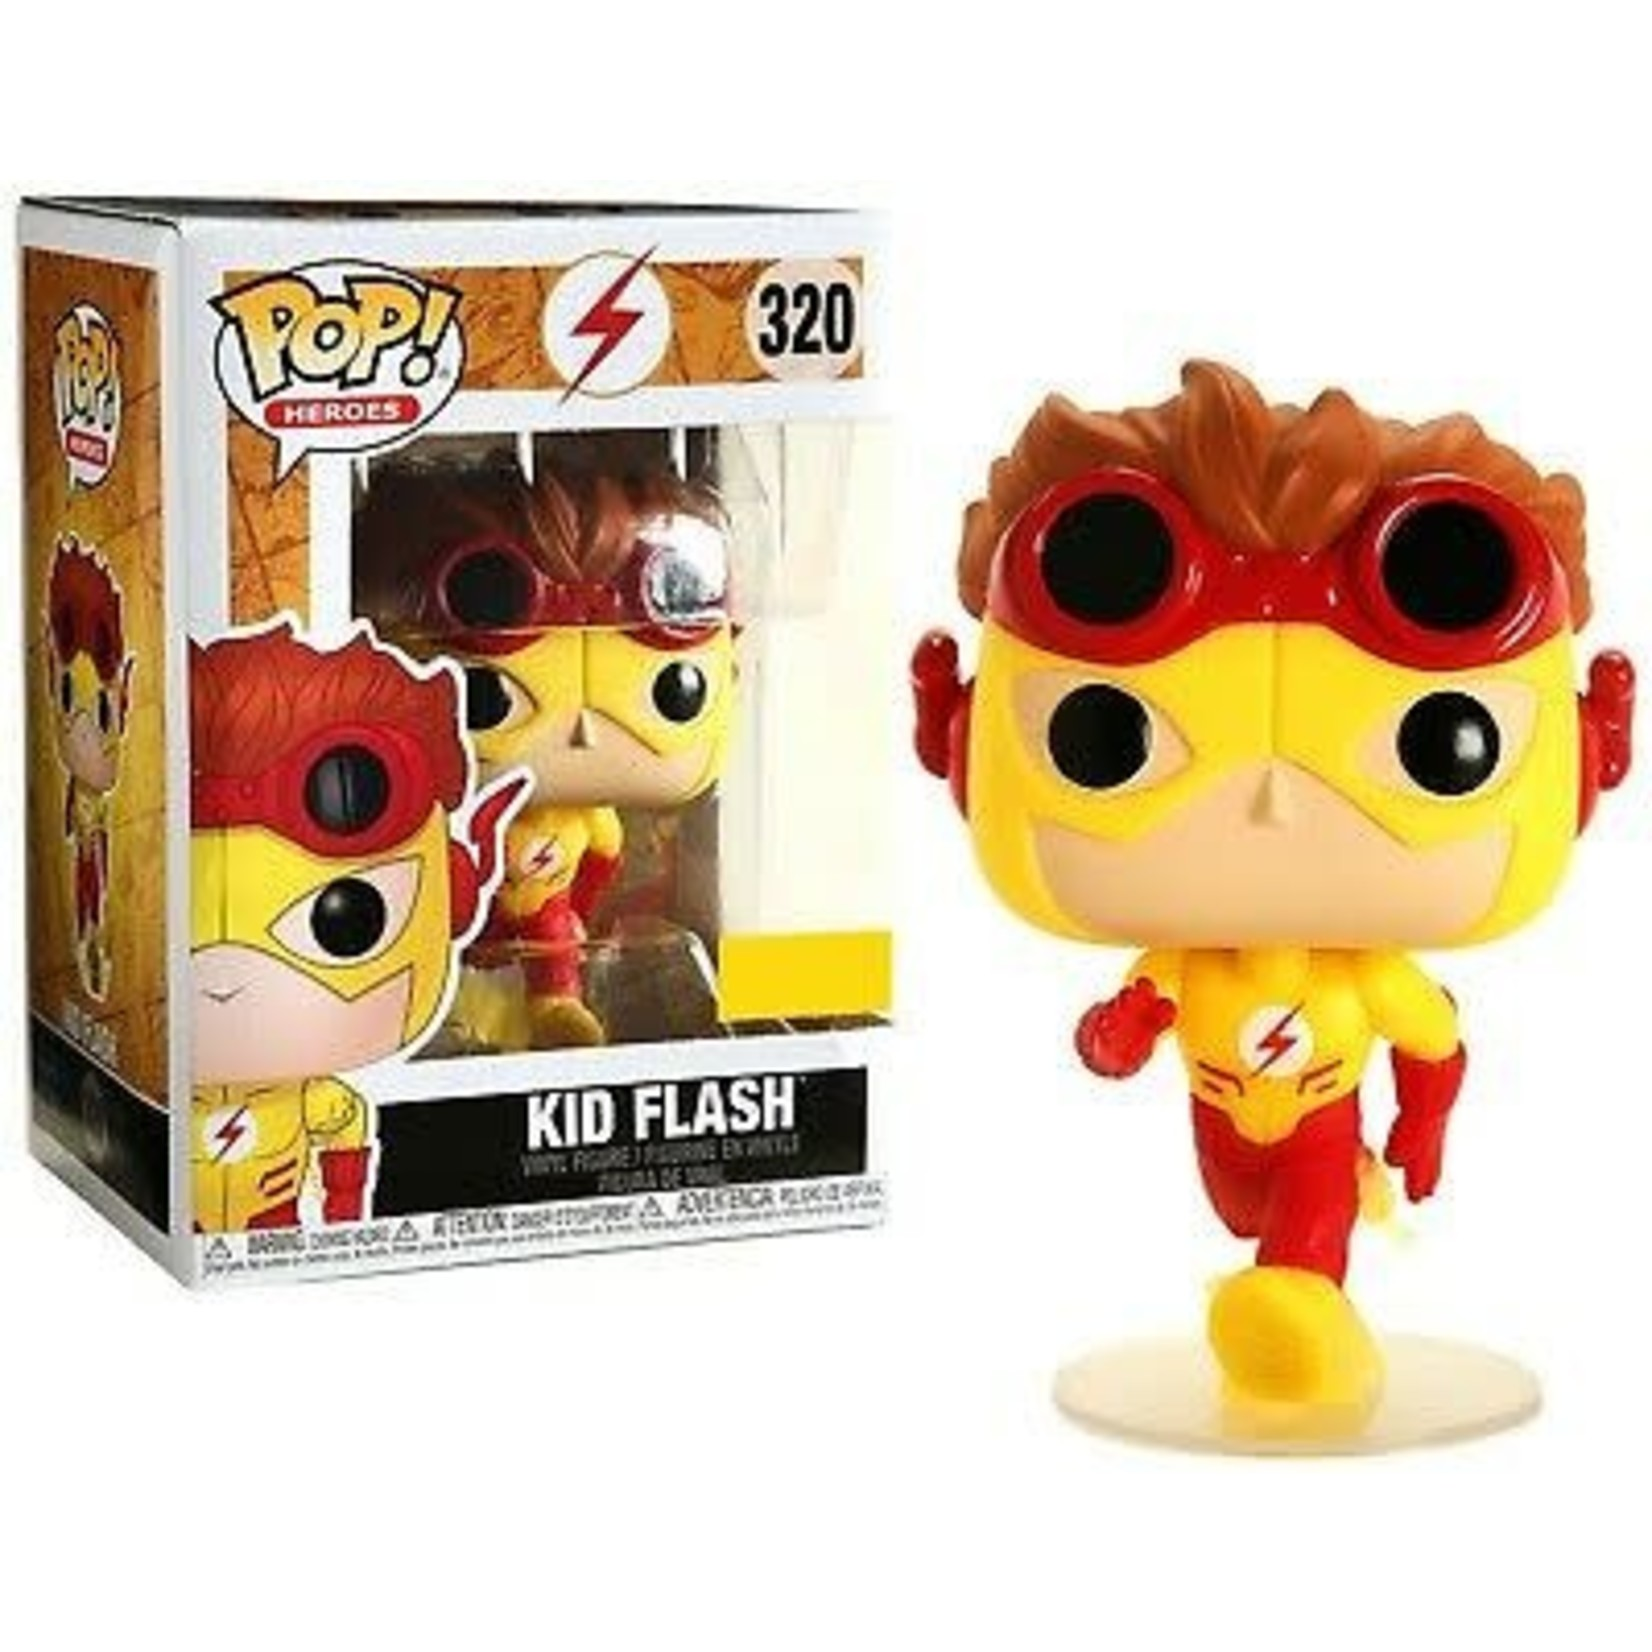 Funko Pop ! heroes - DC Comics - Kid Flash - Hot Topic Exclusive